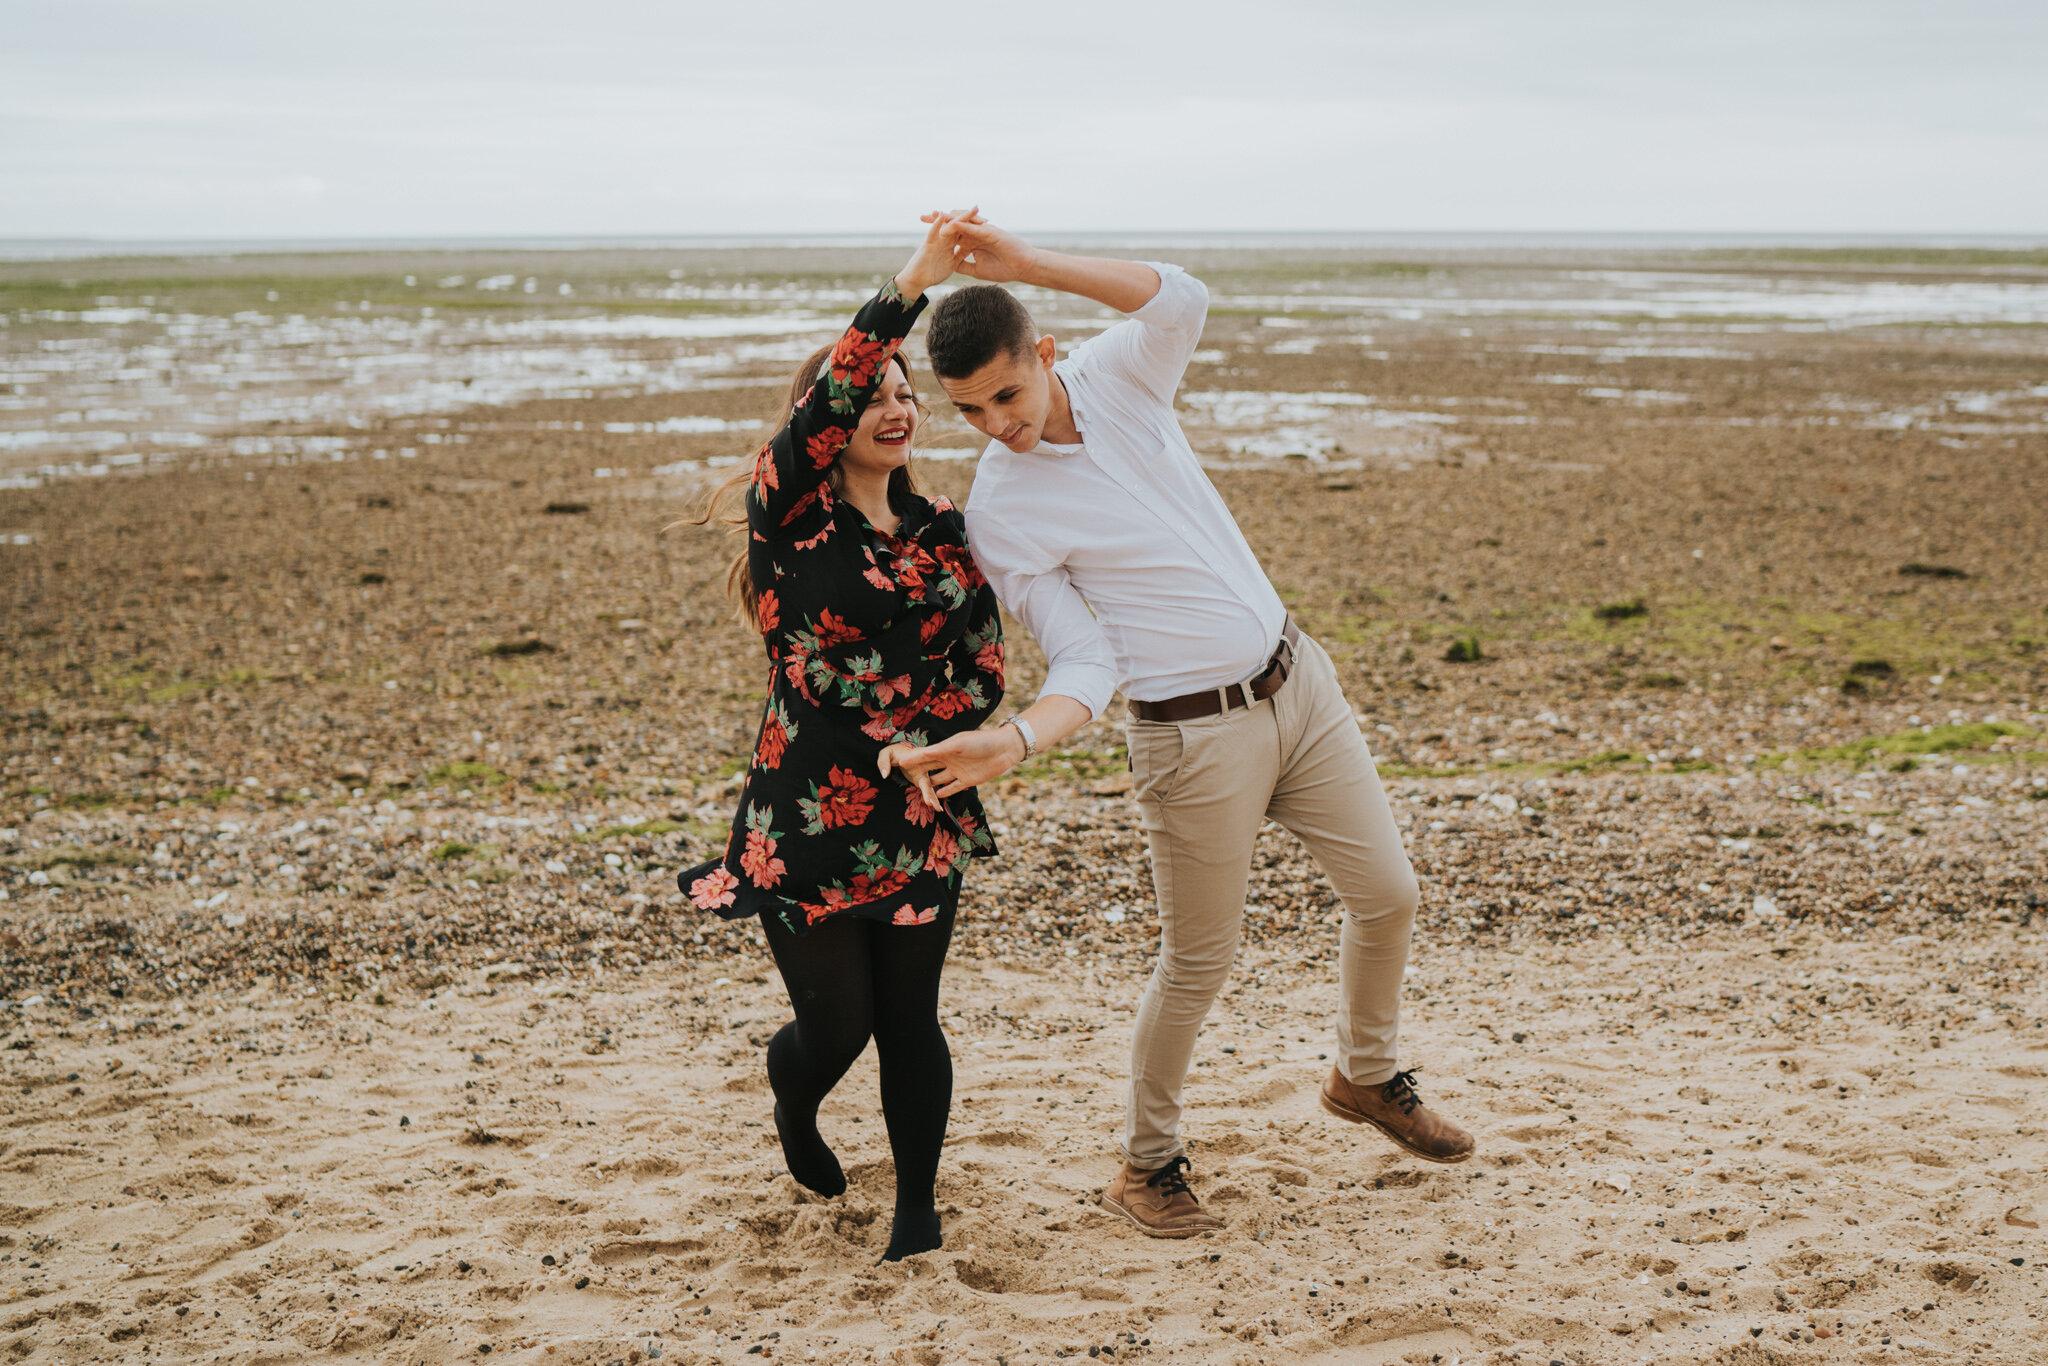 engagement-pre-wedding-hannah-michael-cudmore-grove-east-mersea-grace-elizabeth-colchester-essex-devon-suffolk-and-norfolk-alternative-wedding-and-family-photographer (47 of 51).jpg